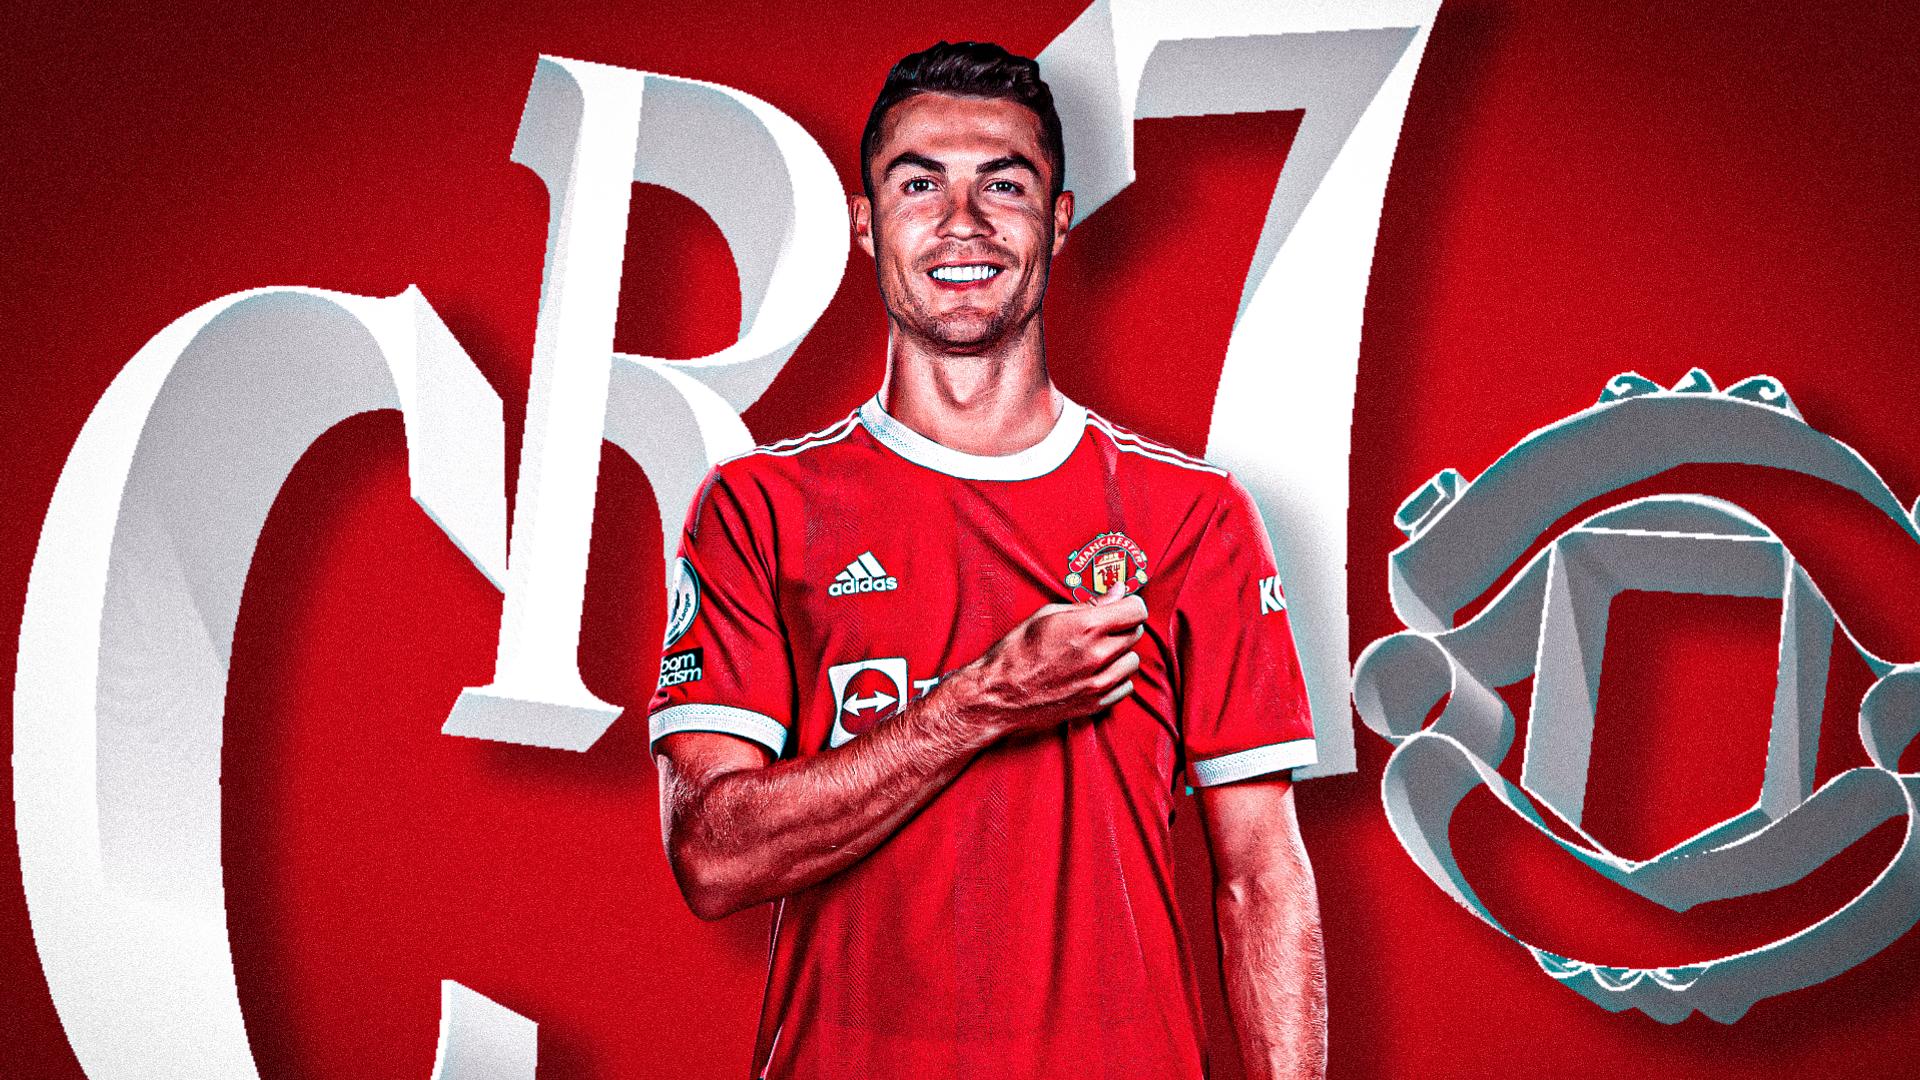 Cristiano Ronaldo debut: Watch free match highlights of Man Utd vs Newcastle with Sky Sports